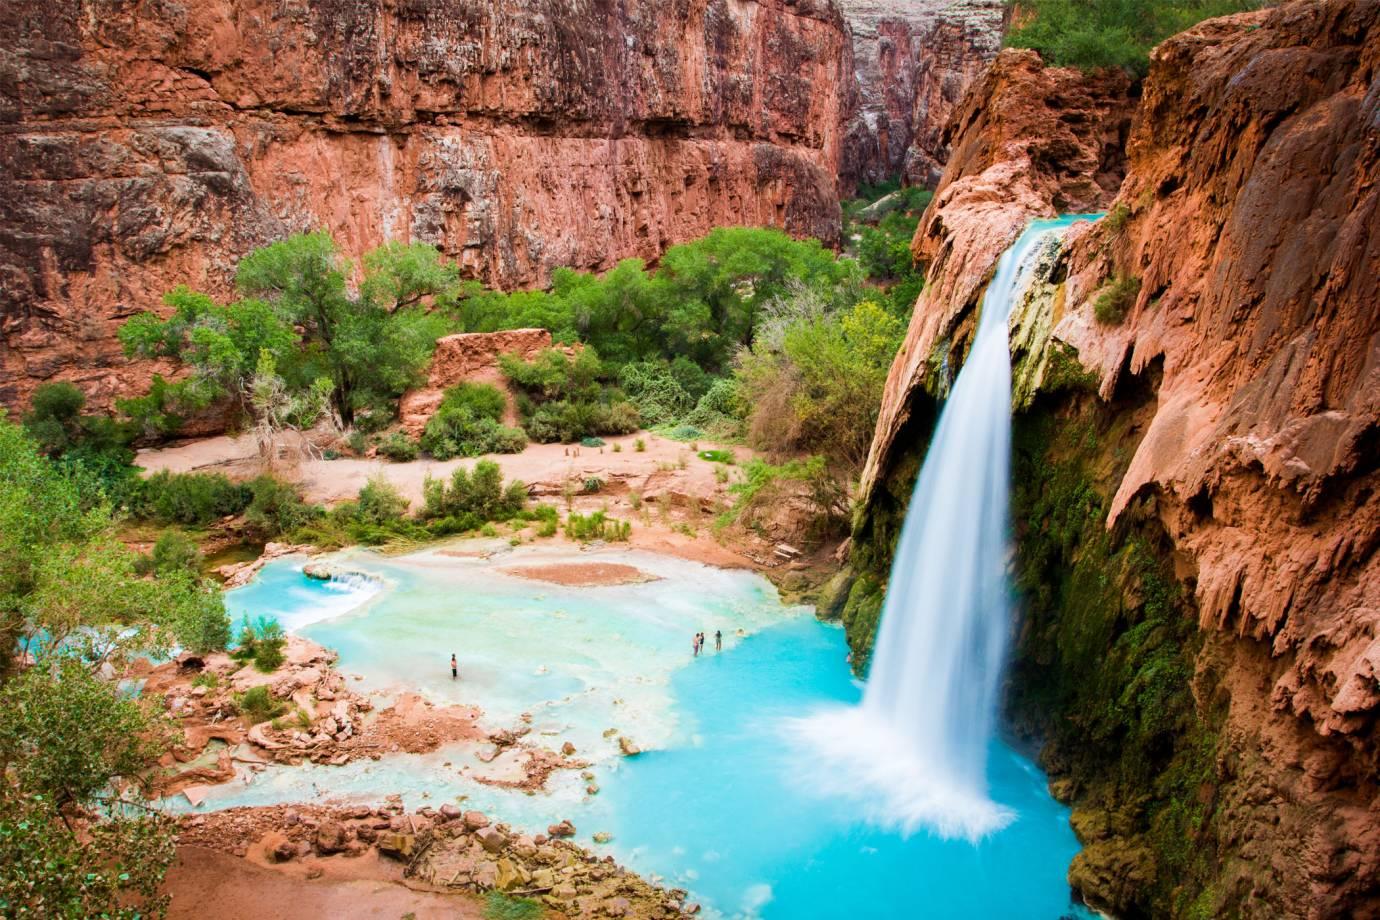 swimming holes perfect for a summer dip - havasu falls